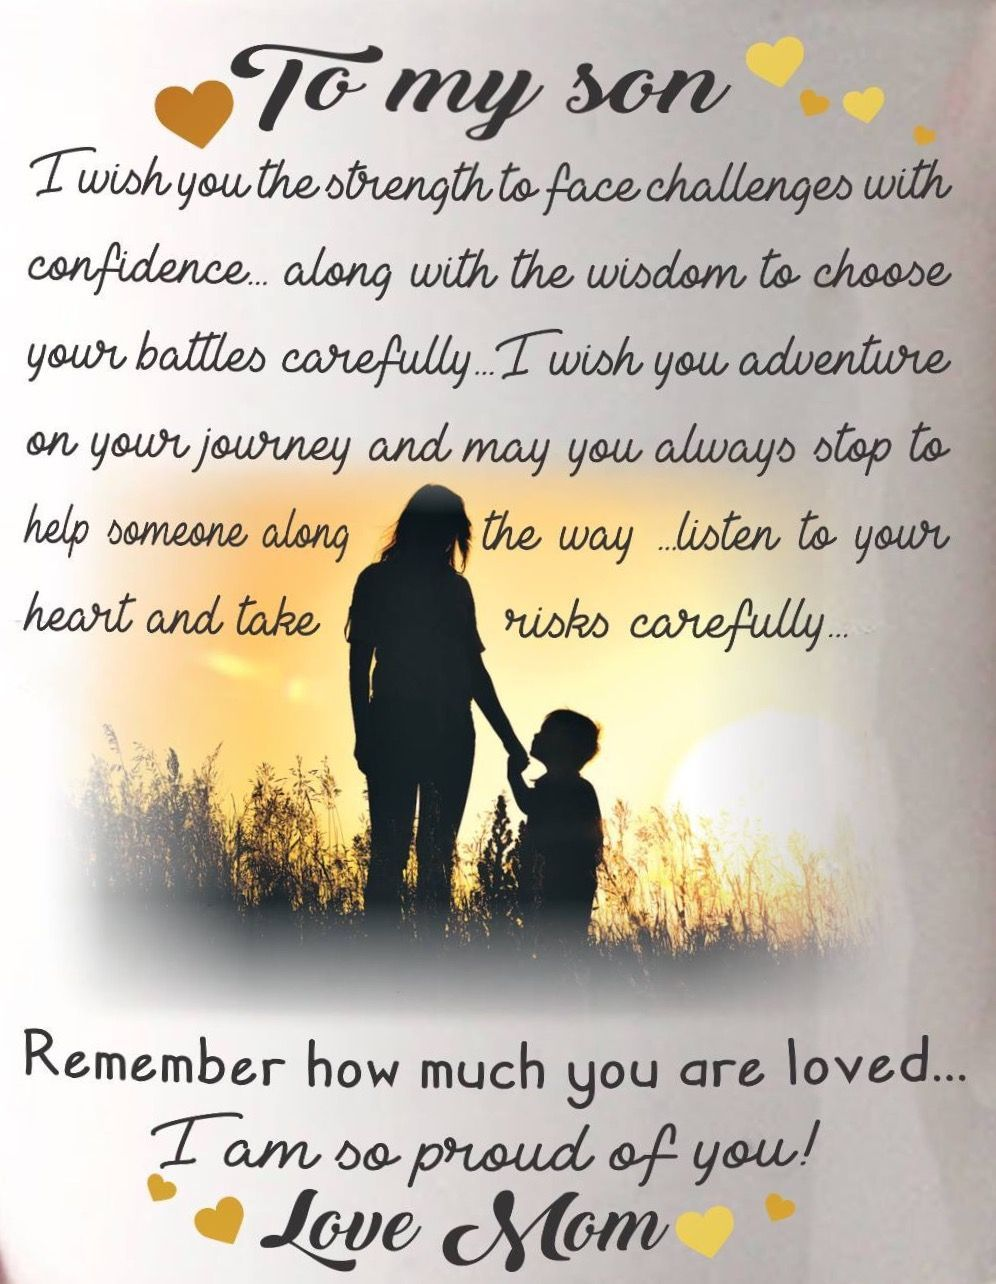 Love my son mother   son bond !!! Still ALWAYS A DAILY CHALLANGE